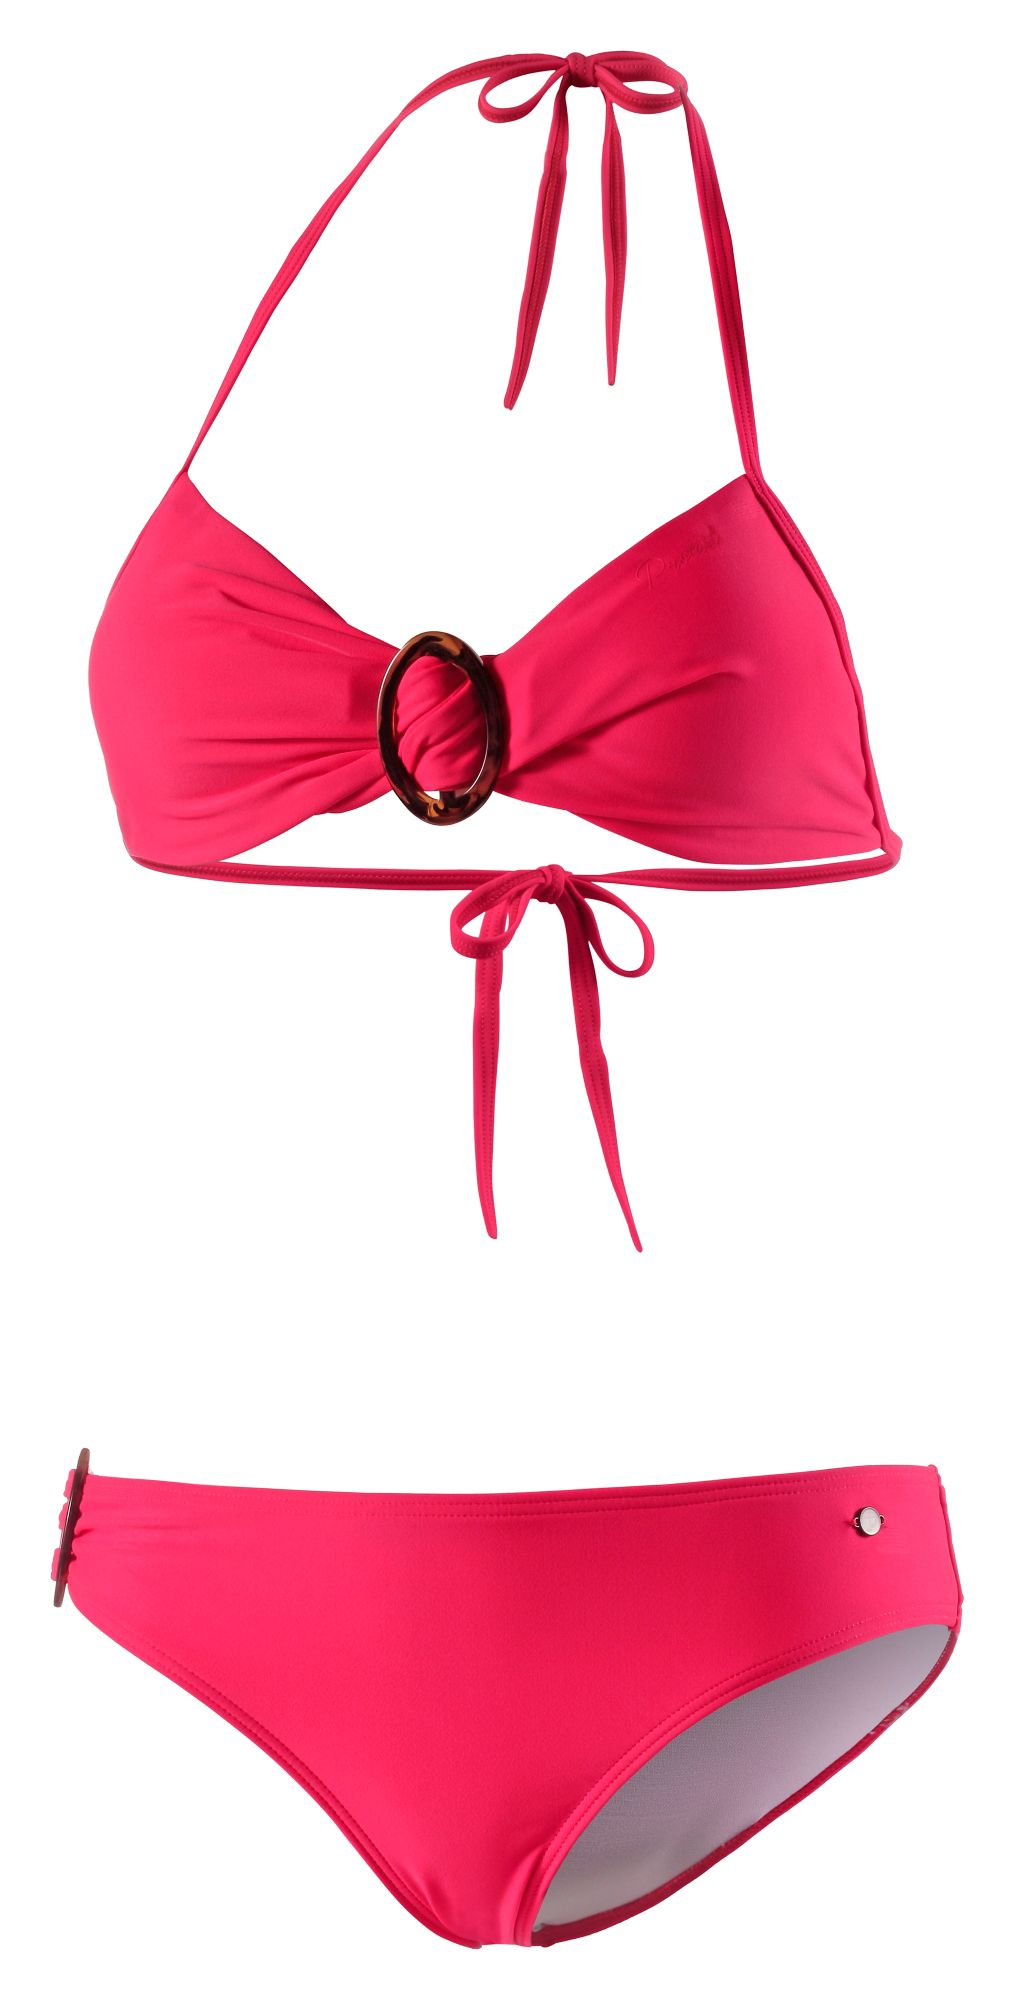 Bandeau Bikini Damen in rot, Größe 36 / B